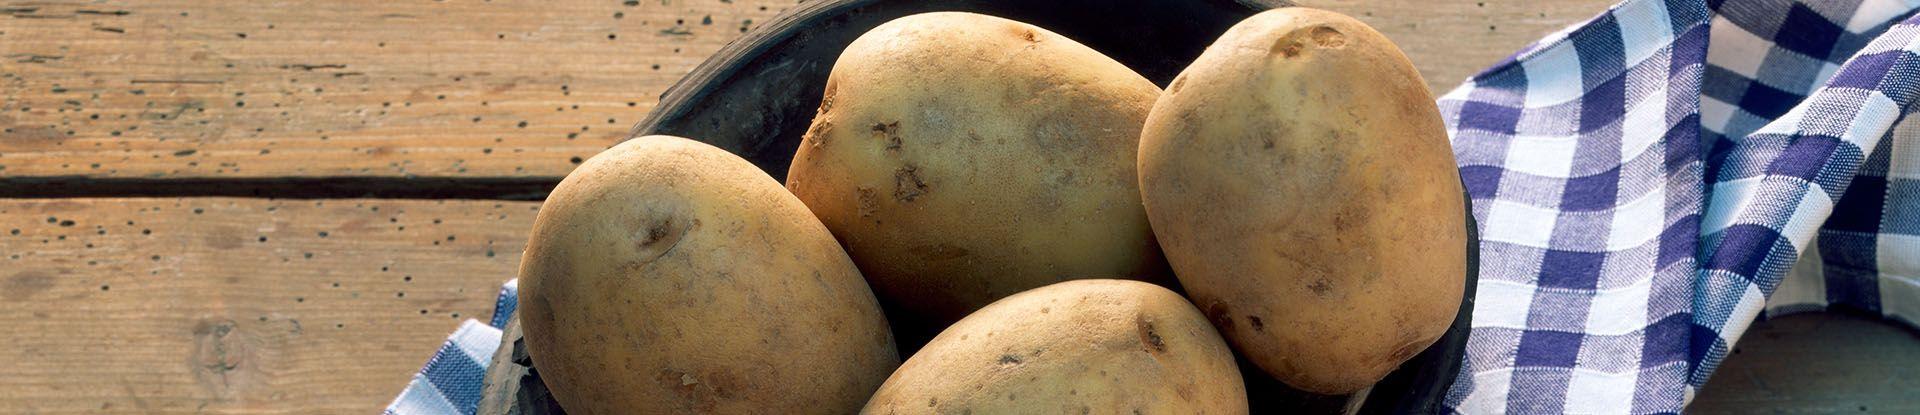 Heidekartoffeln